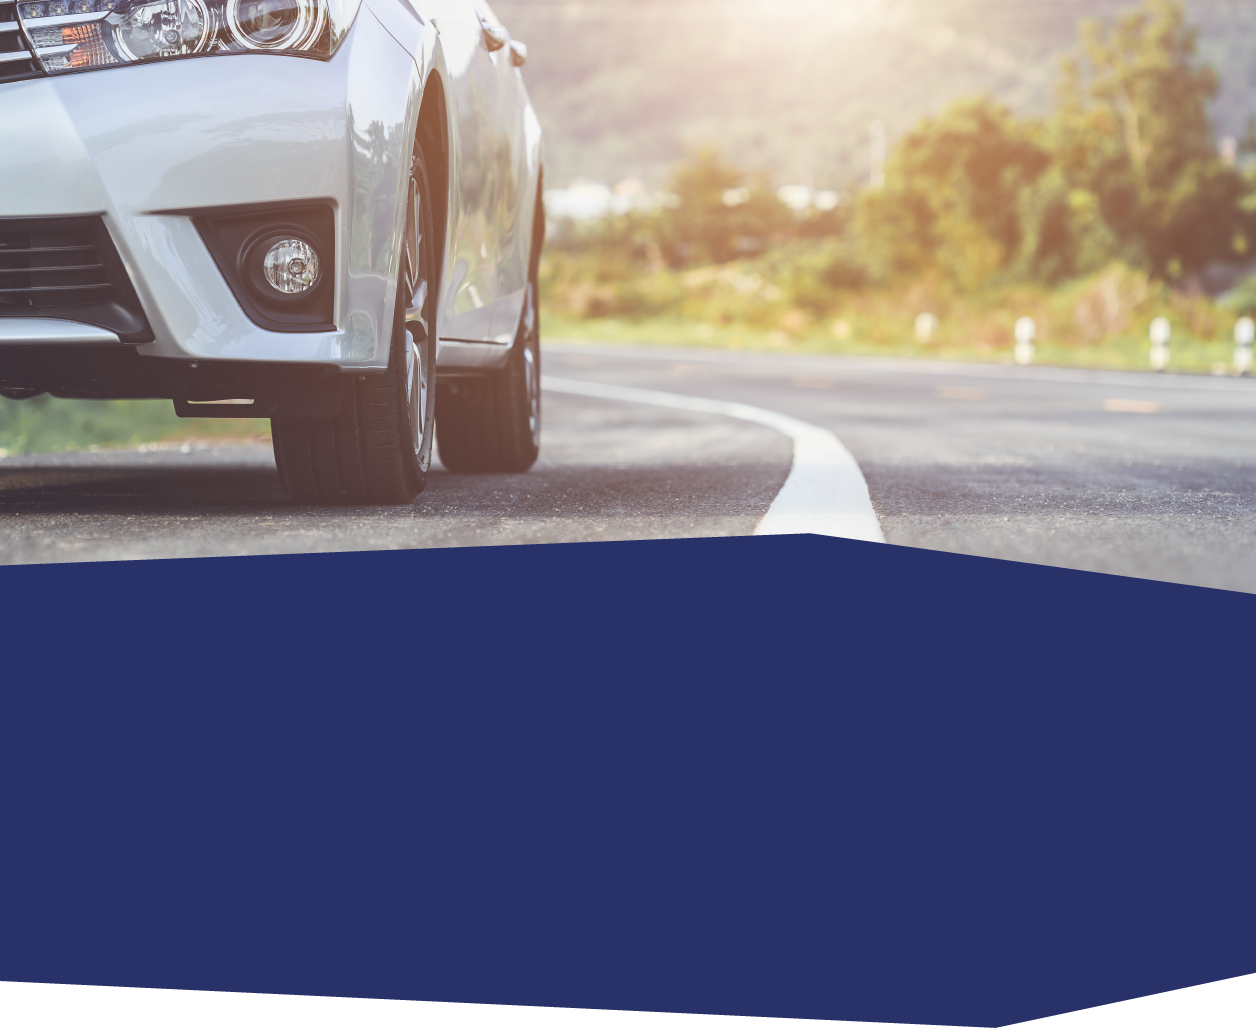 ch2 car driving - reimbursements taxable?